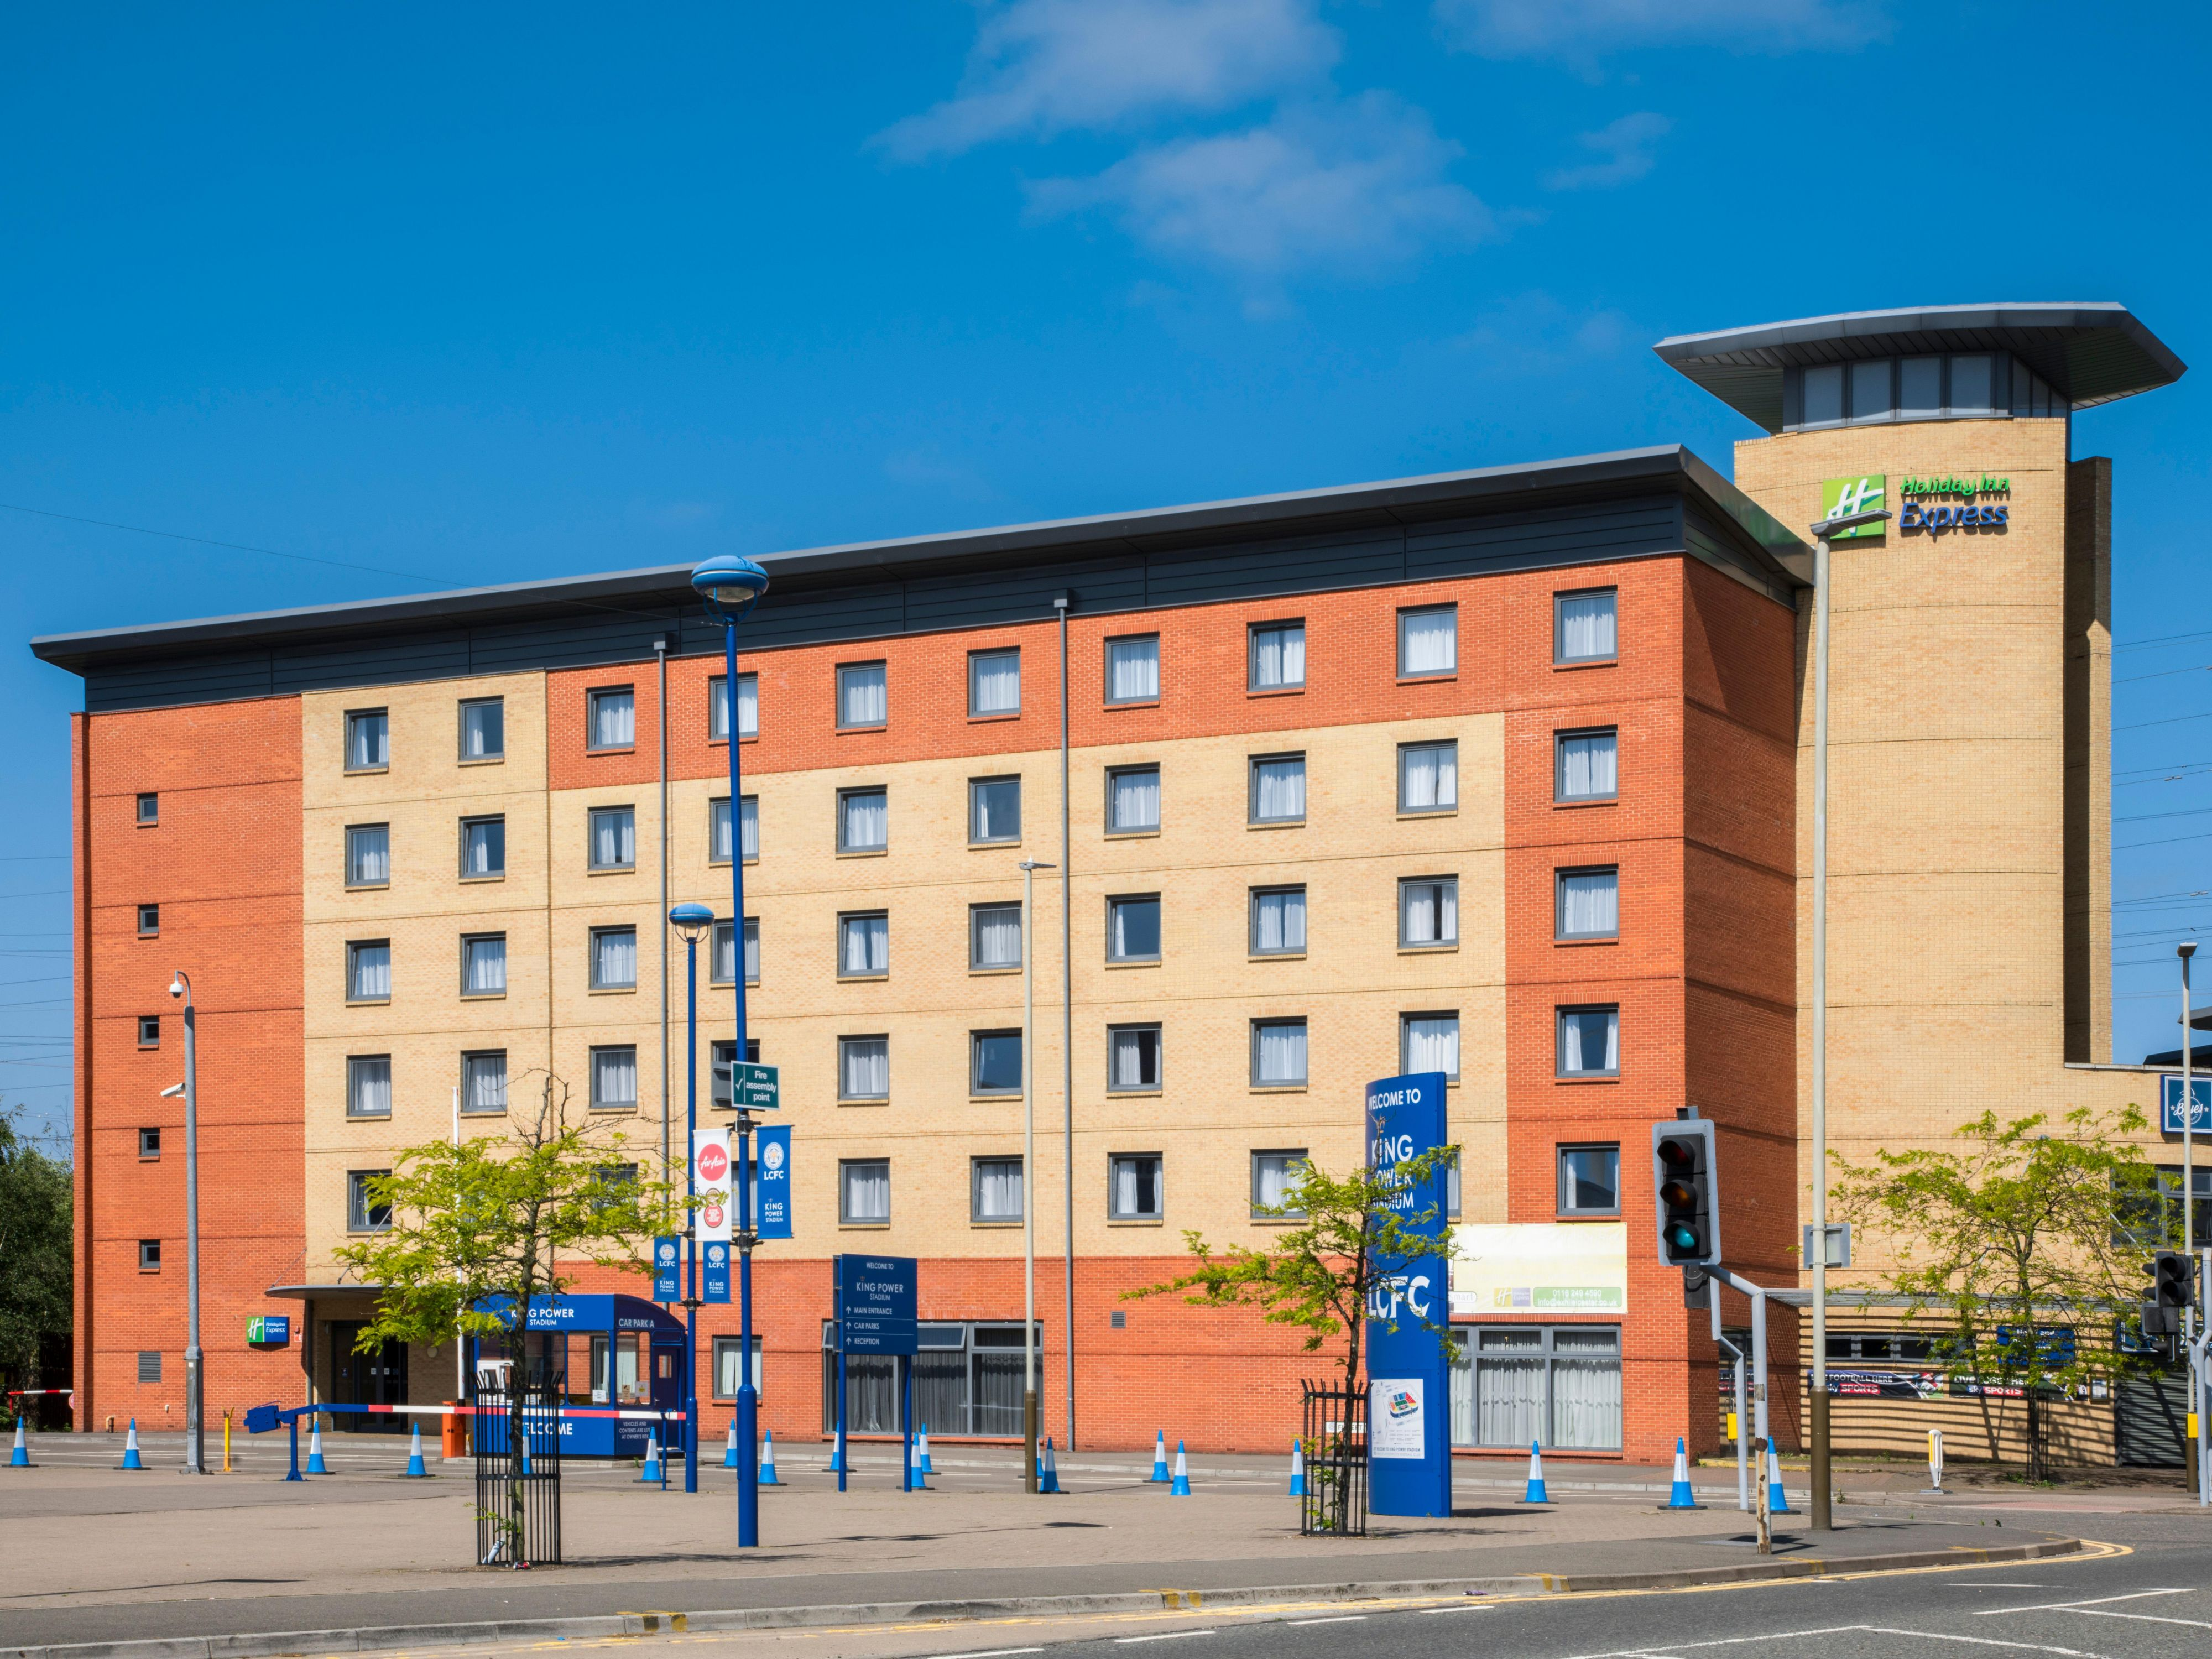 Hotels Near Stadium Holiday Inn Express Leicester City